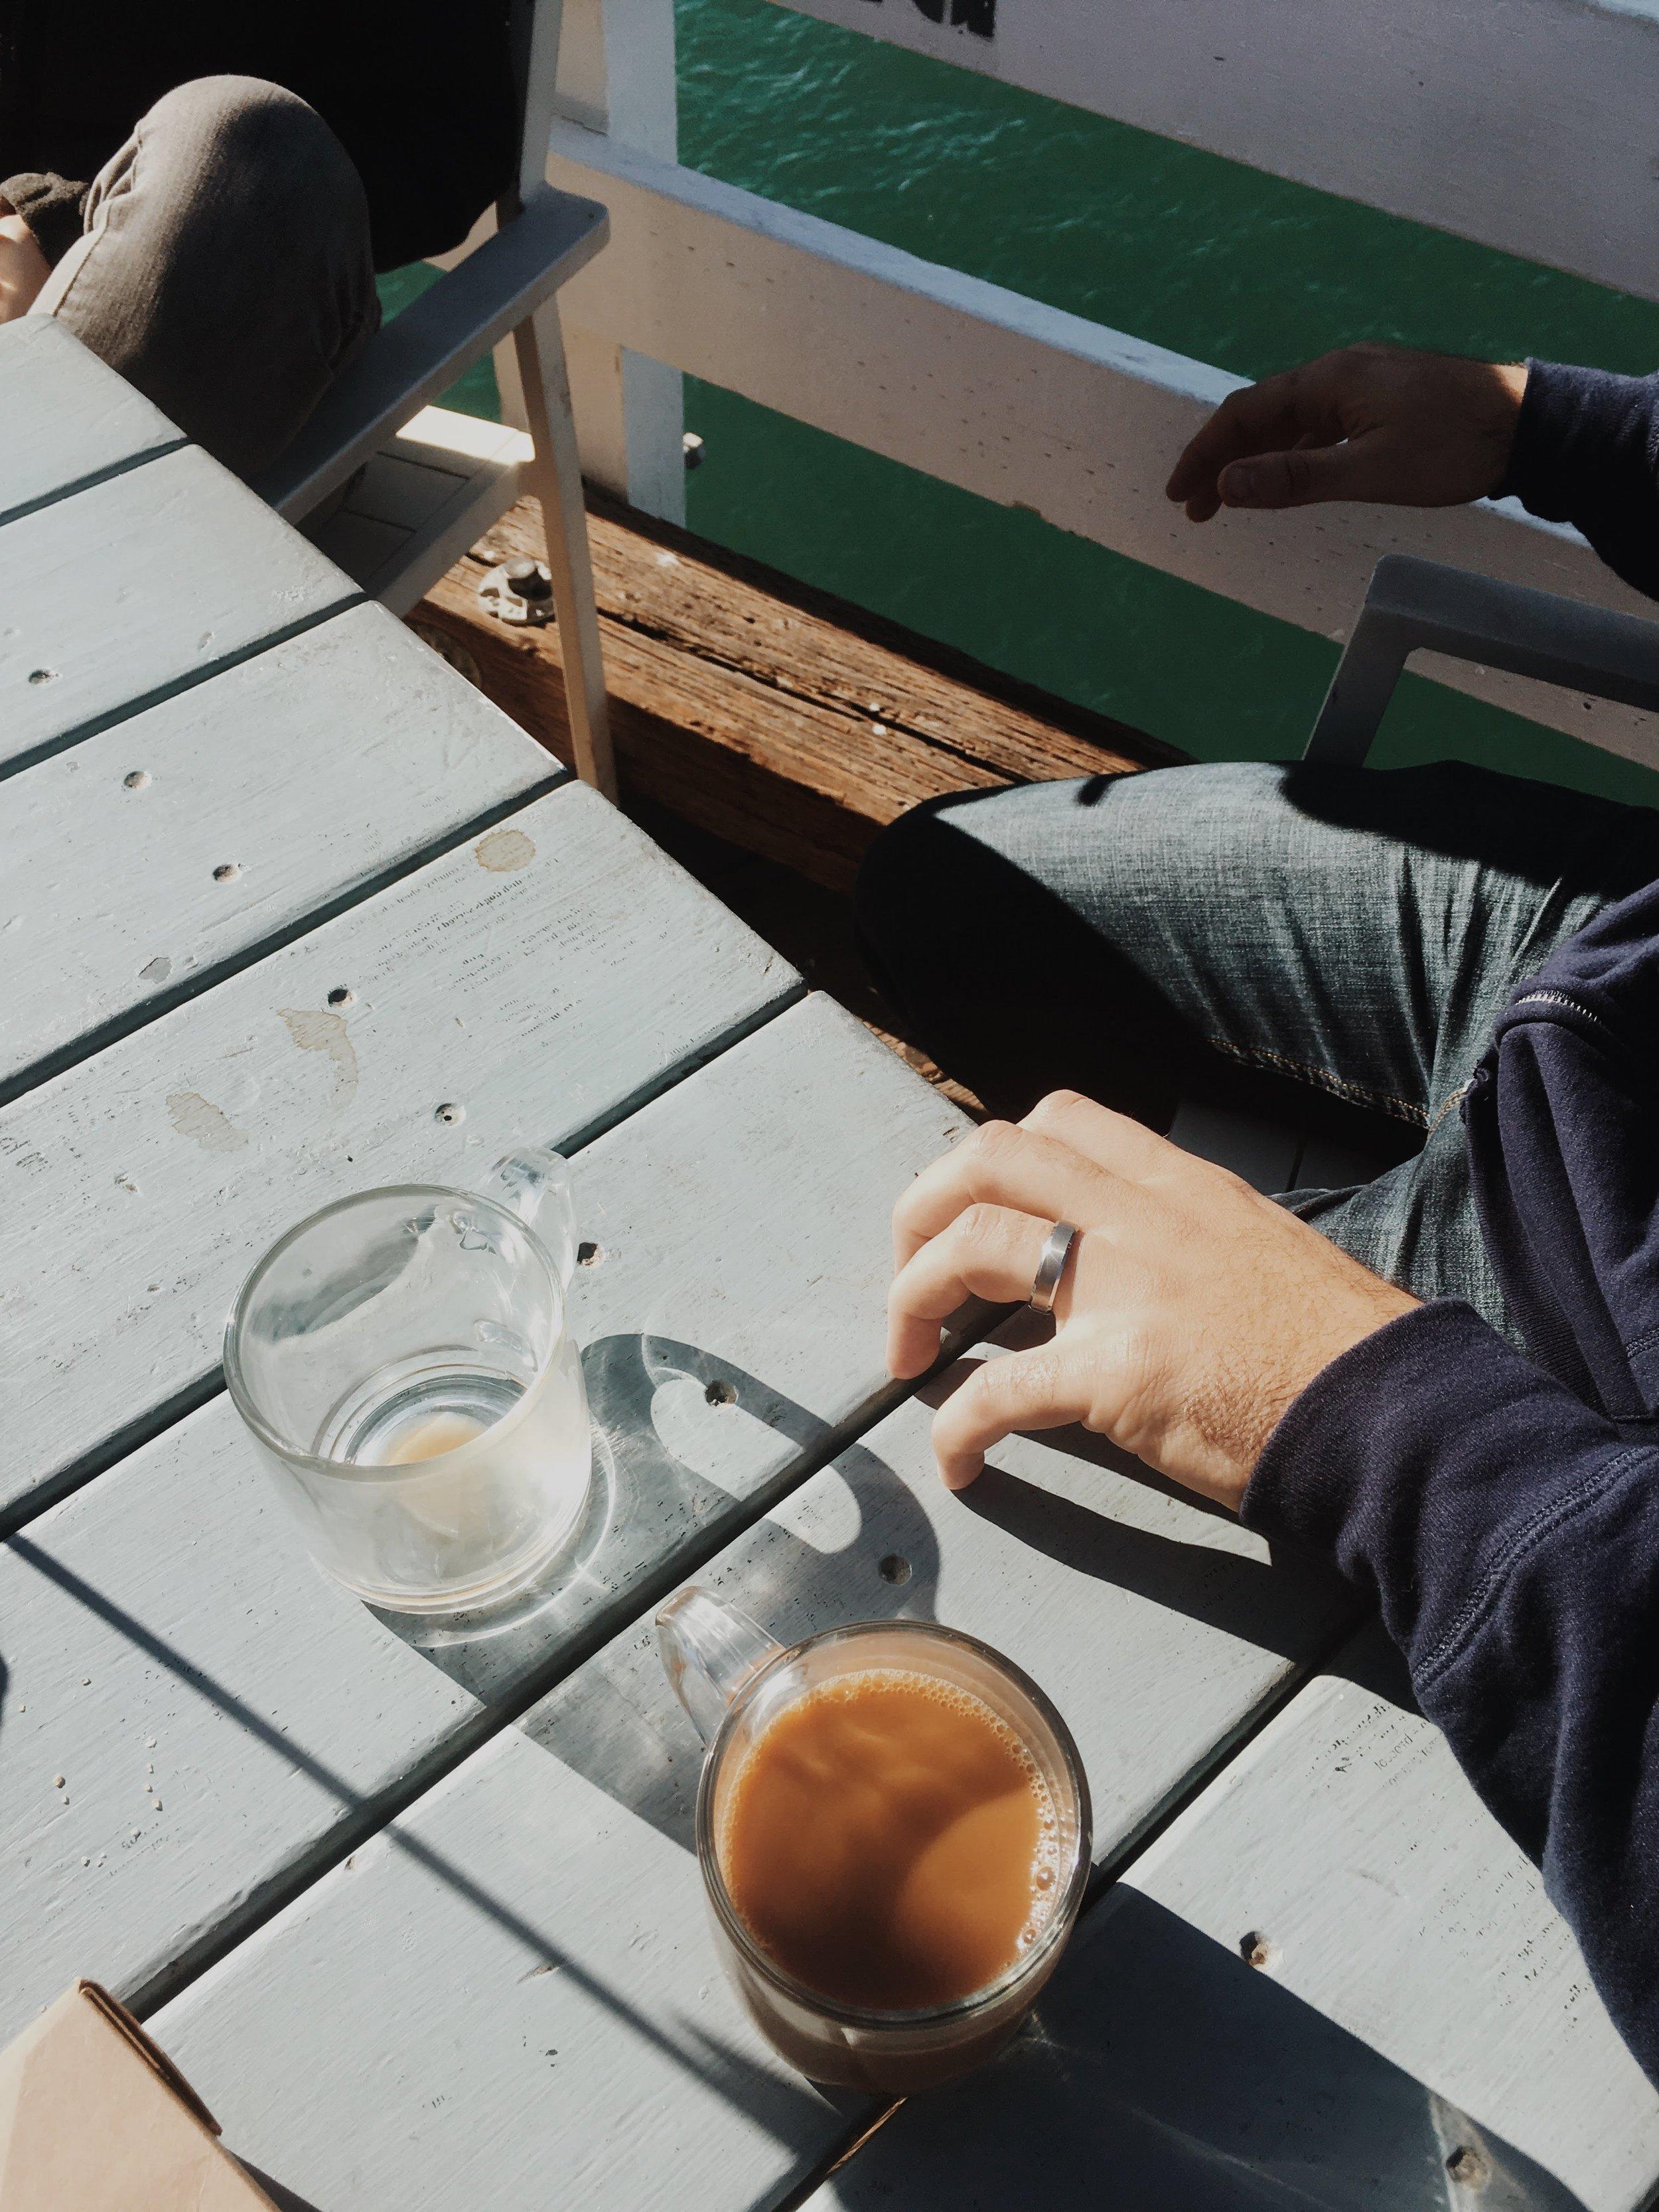 Drinking multiple cups of coffee on the deck of Malibu Farm restaurant.